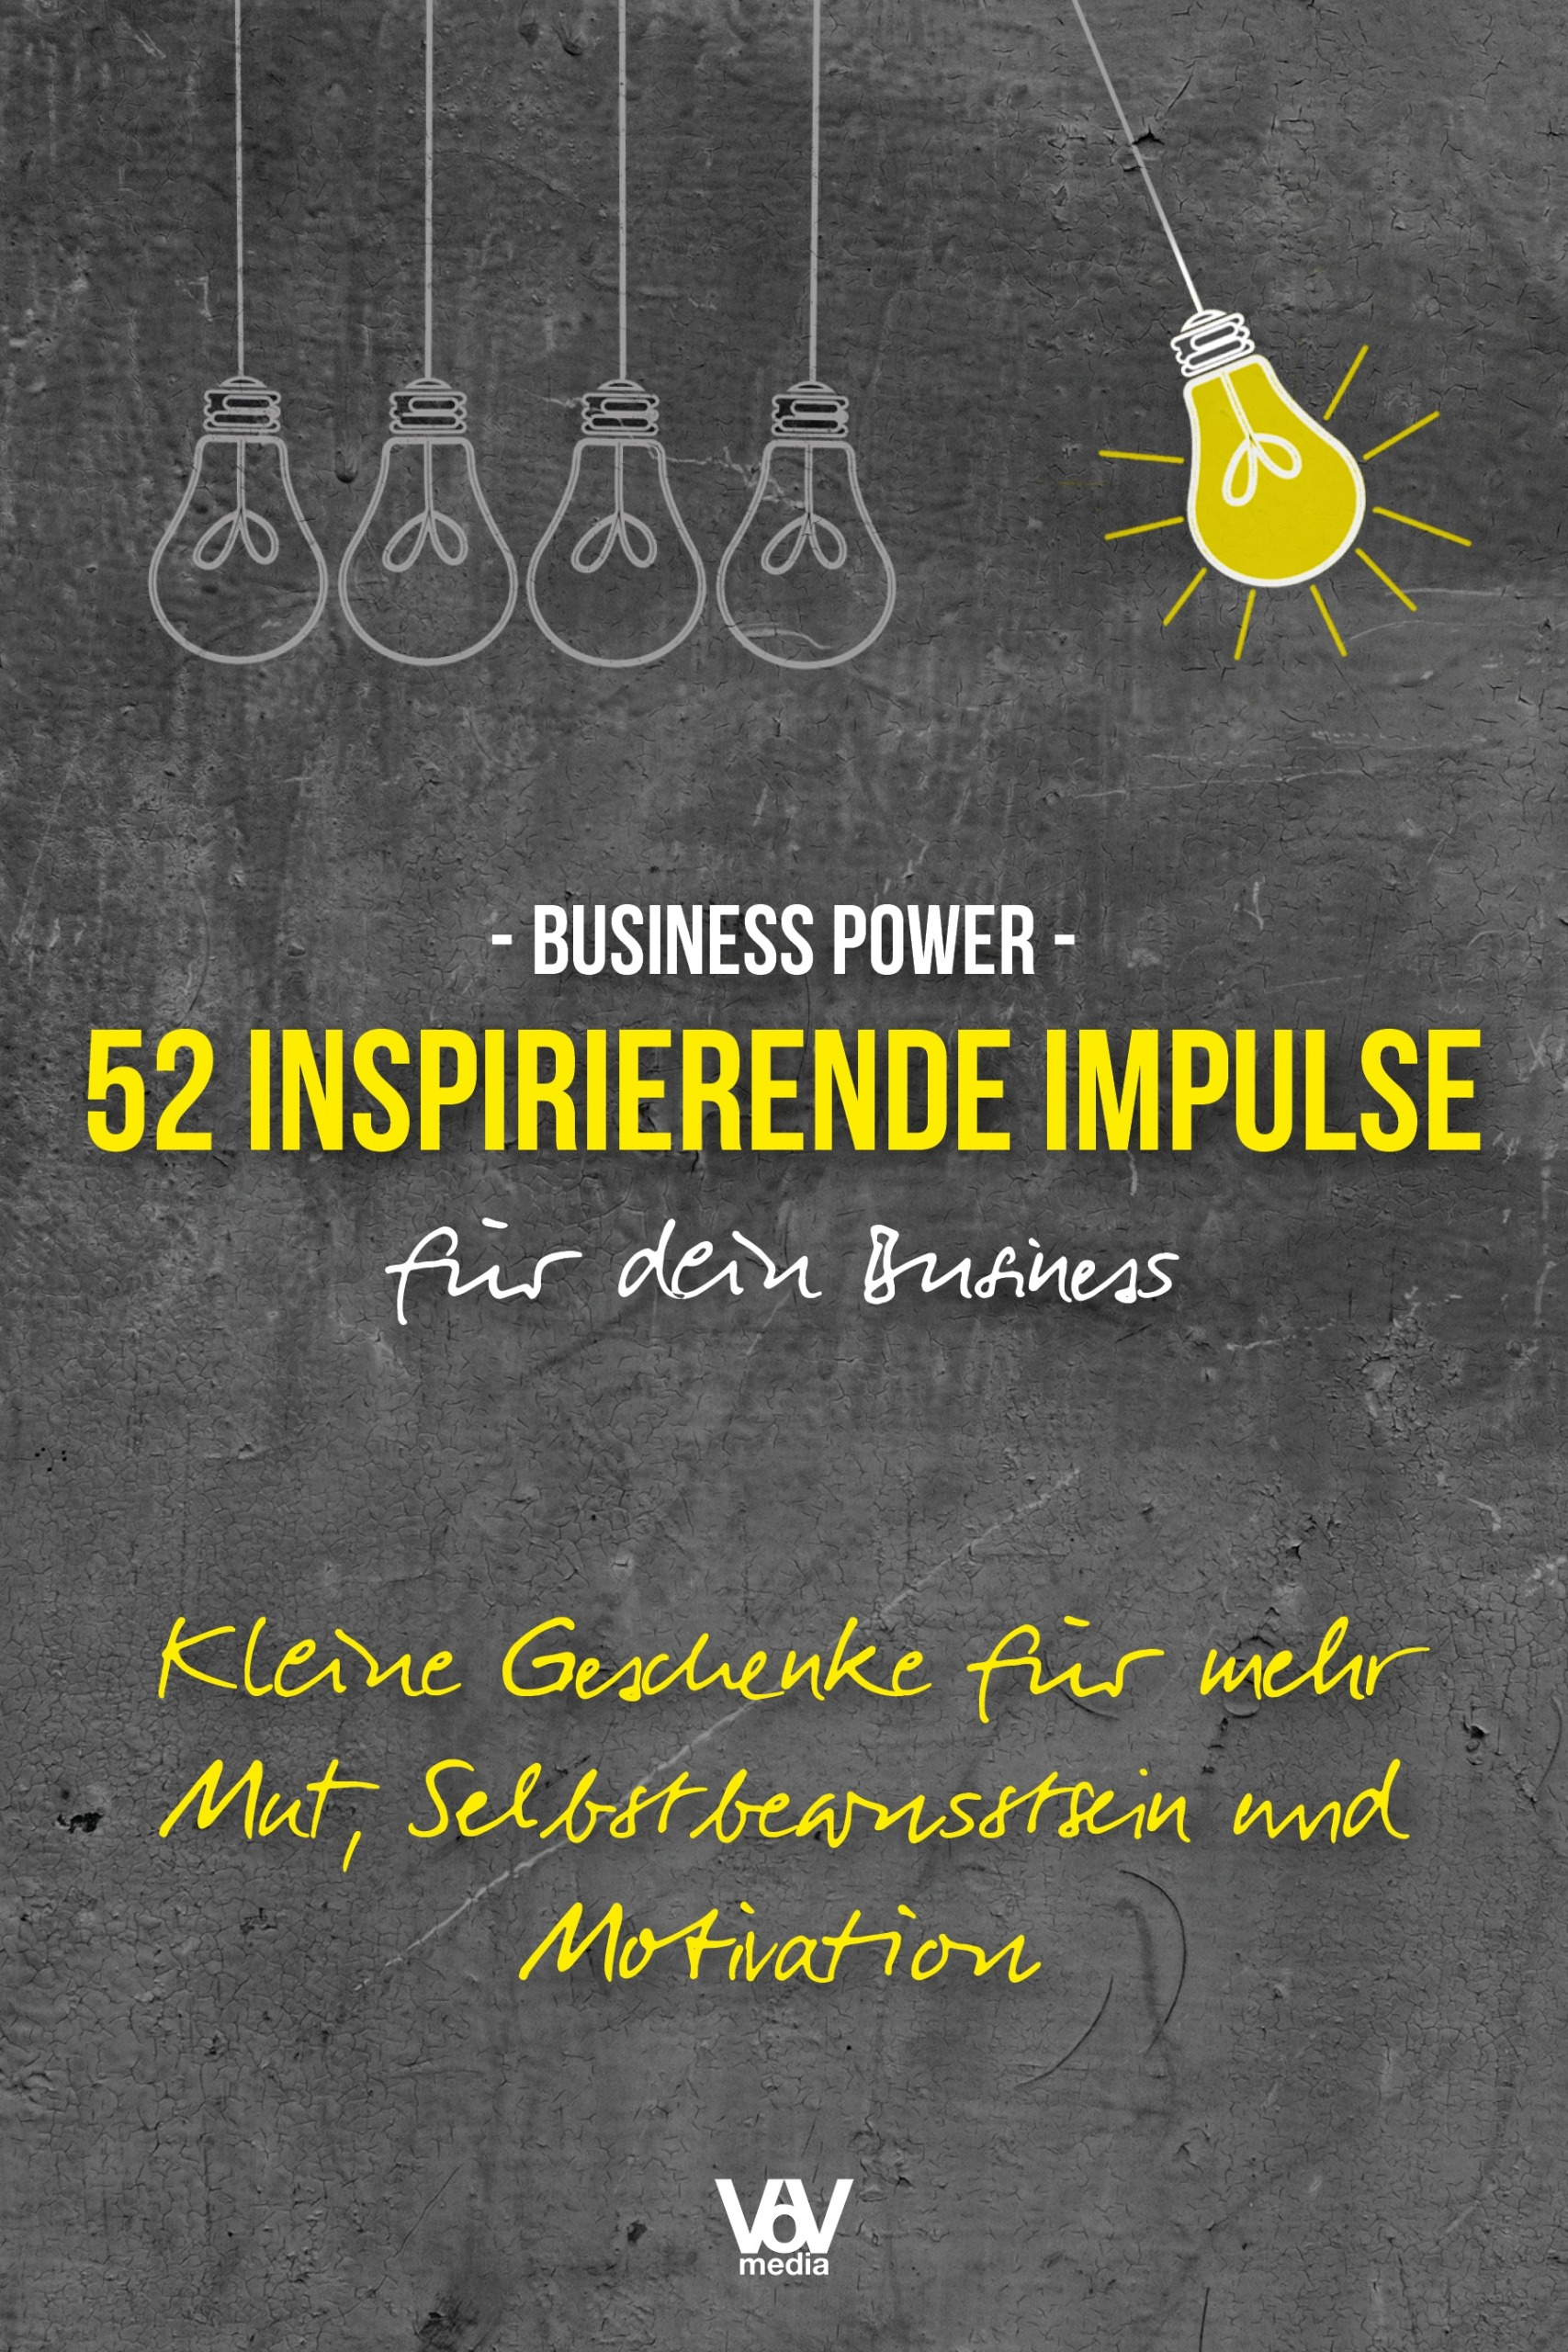 52 inspirierende Impulse - Roman Kmenta